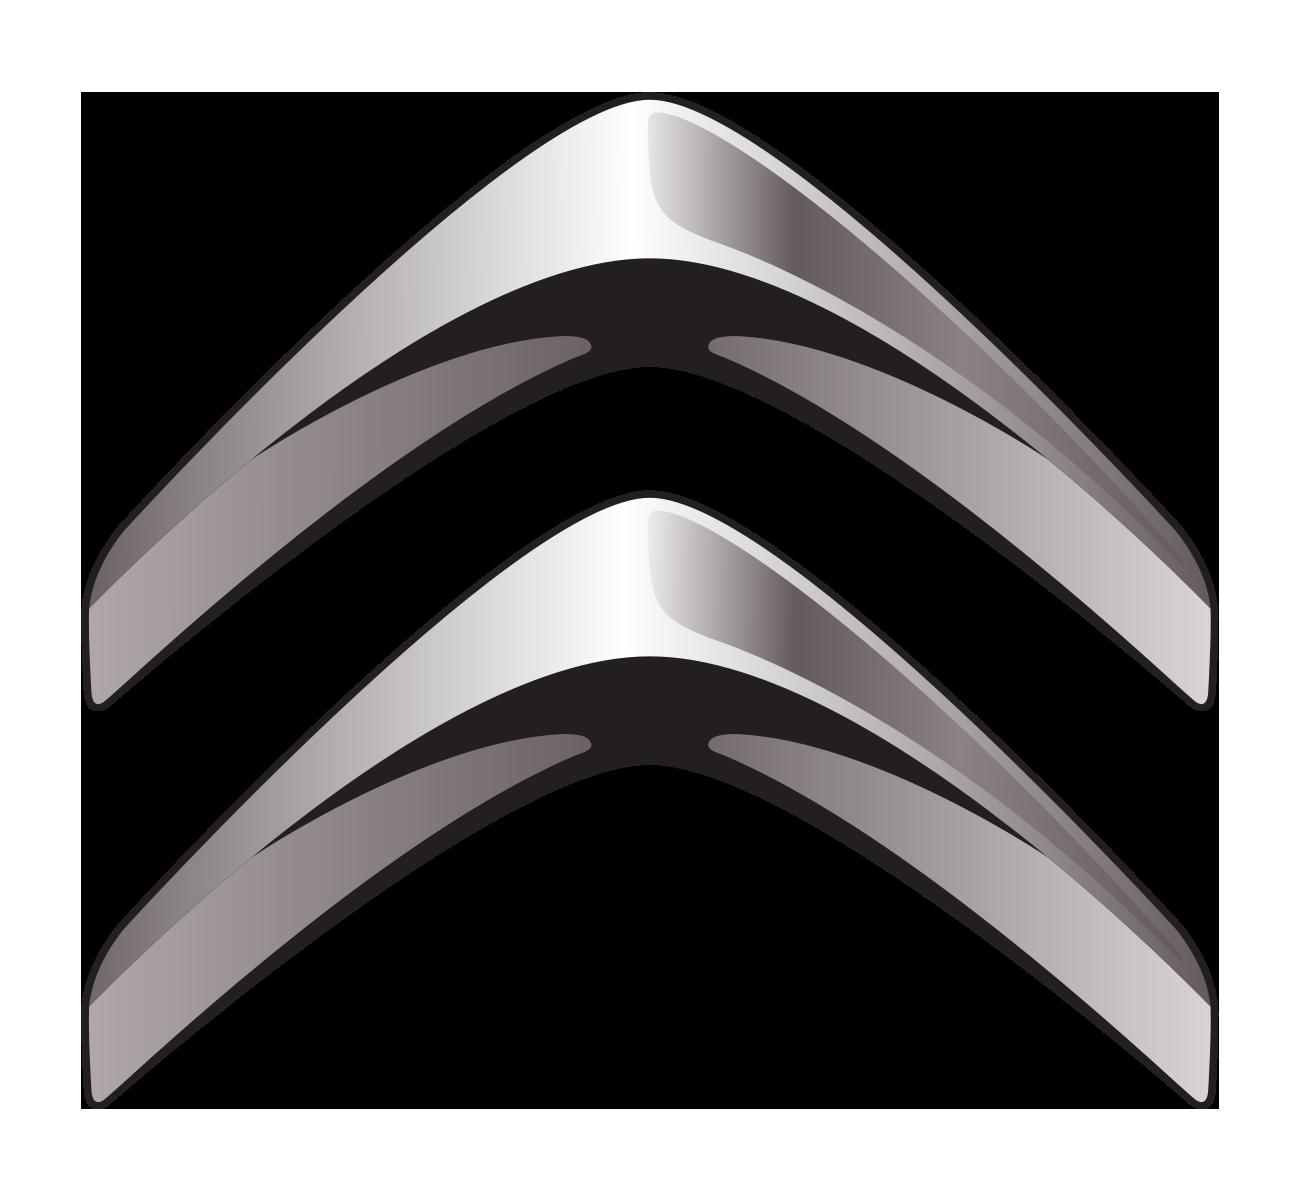 Citroen Car Logo PNG Image Citroen logo, Car logos